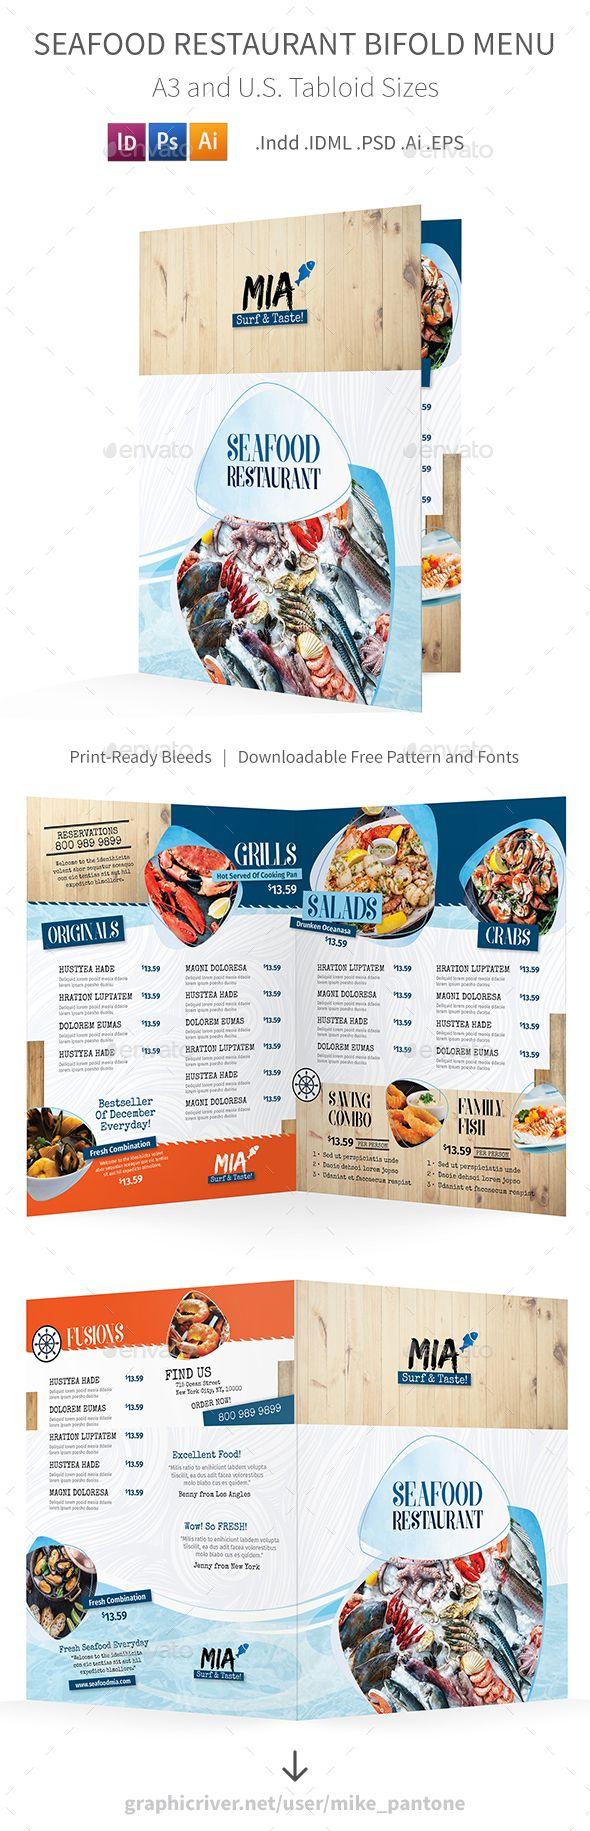 Seafood Restaurant Bifold / Halffold Menu 3 #fish #Fine Dining • Download ➝ https://graphicriver.net/item/seafood-restaurant-bifold-halffold-menu-3/21252810?ref=pxcr